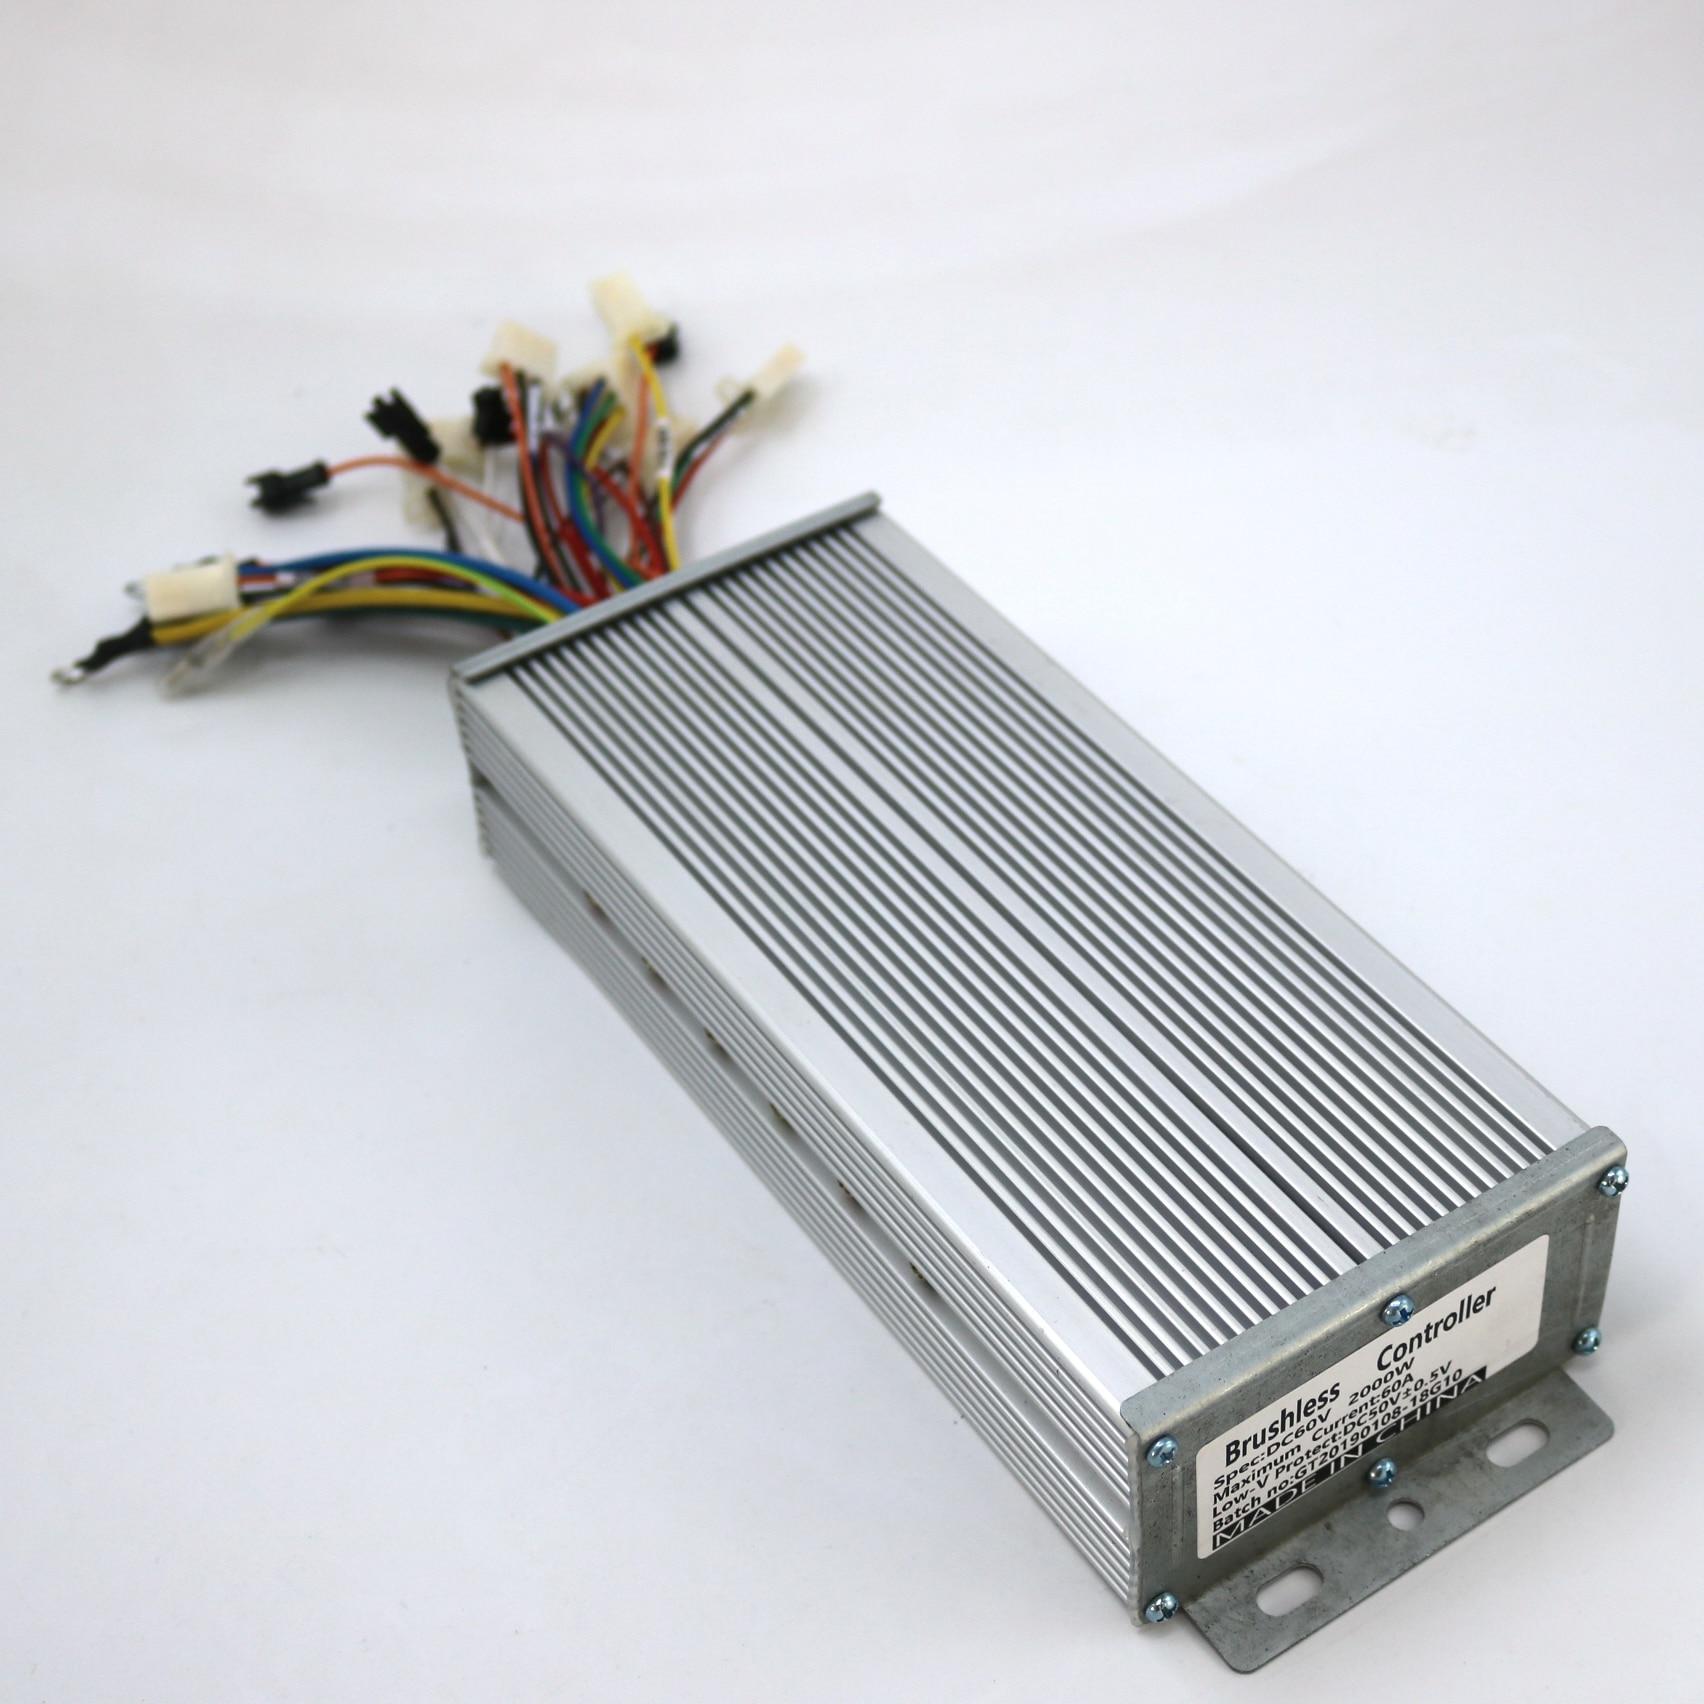 48V-72V 2000W 60A Max Dual Mode Sensor Sensorless Brushless DC Controller Ebikes